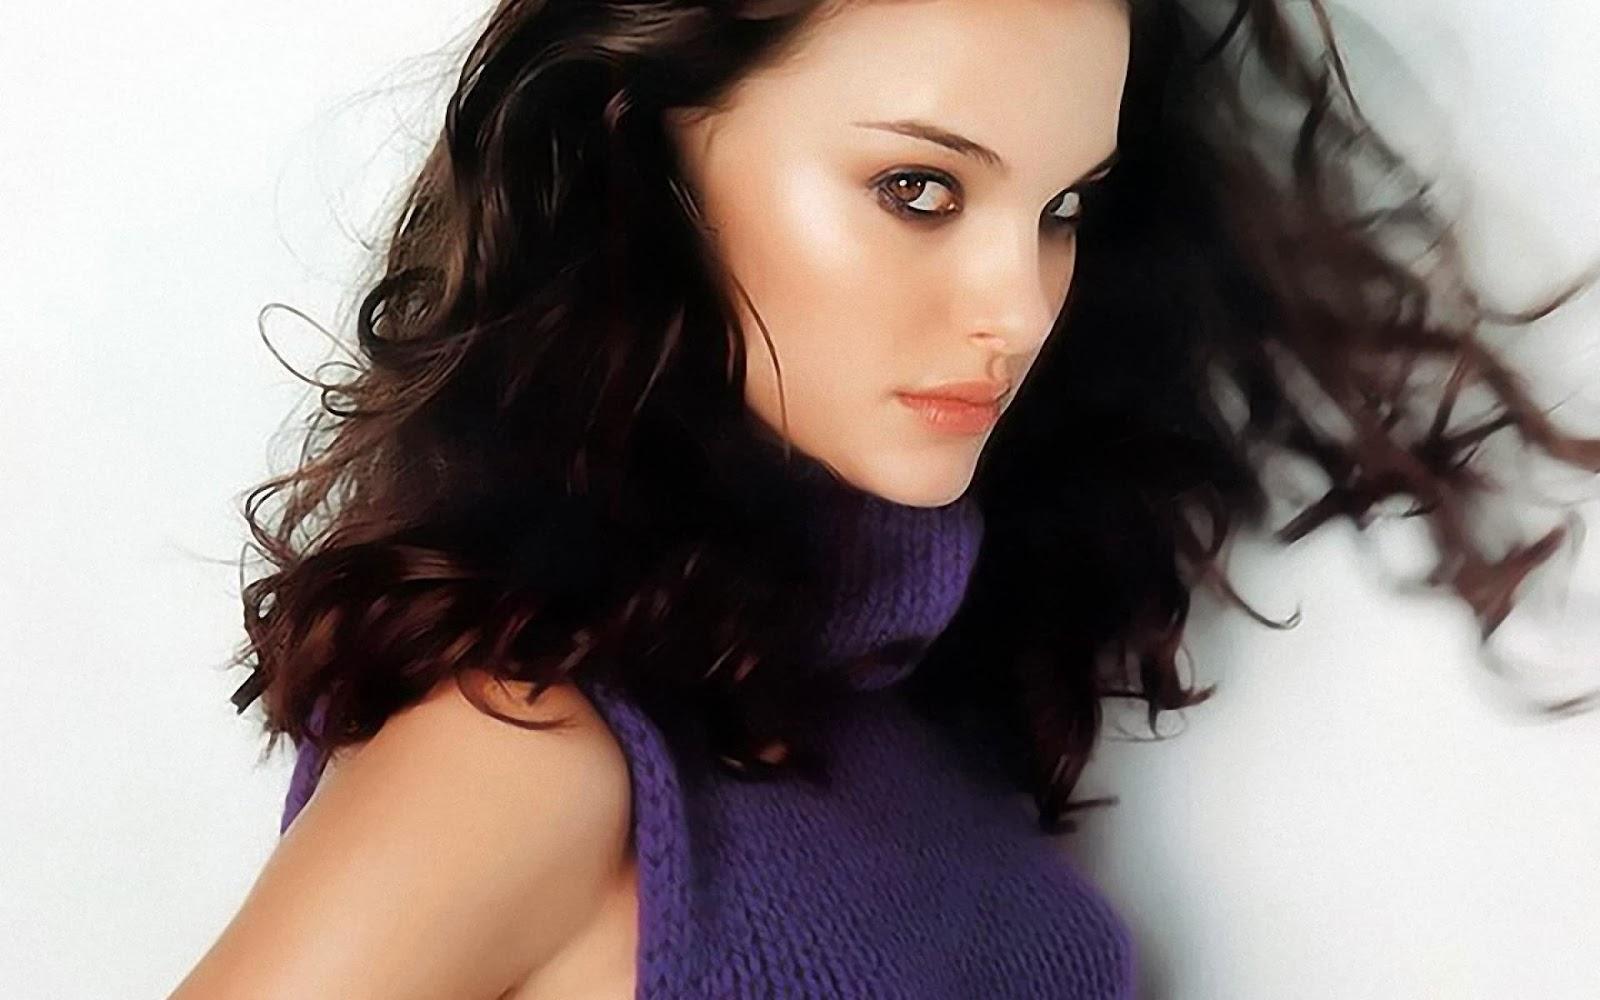 Celebrity Hd Wallpapers Actress Natalie Portman Hq Pictures-9599